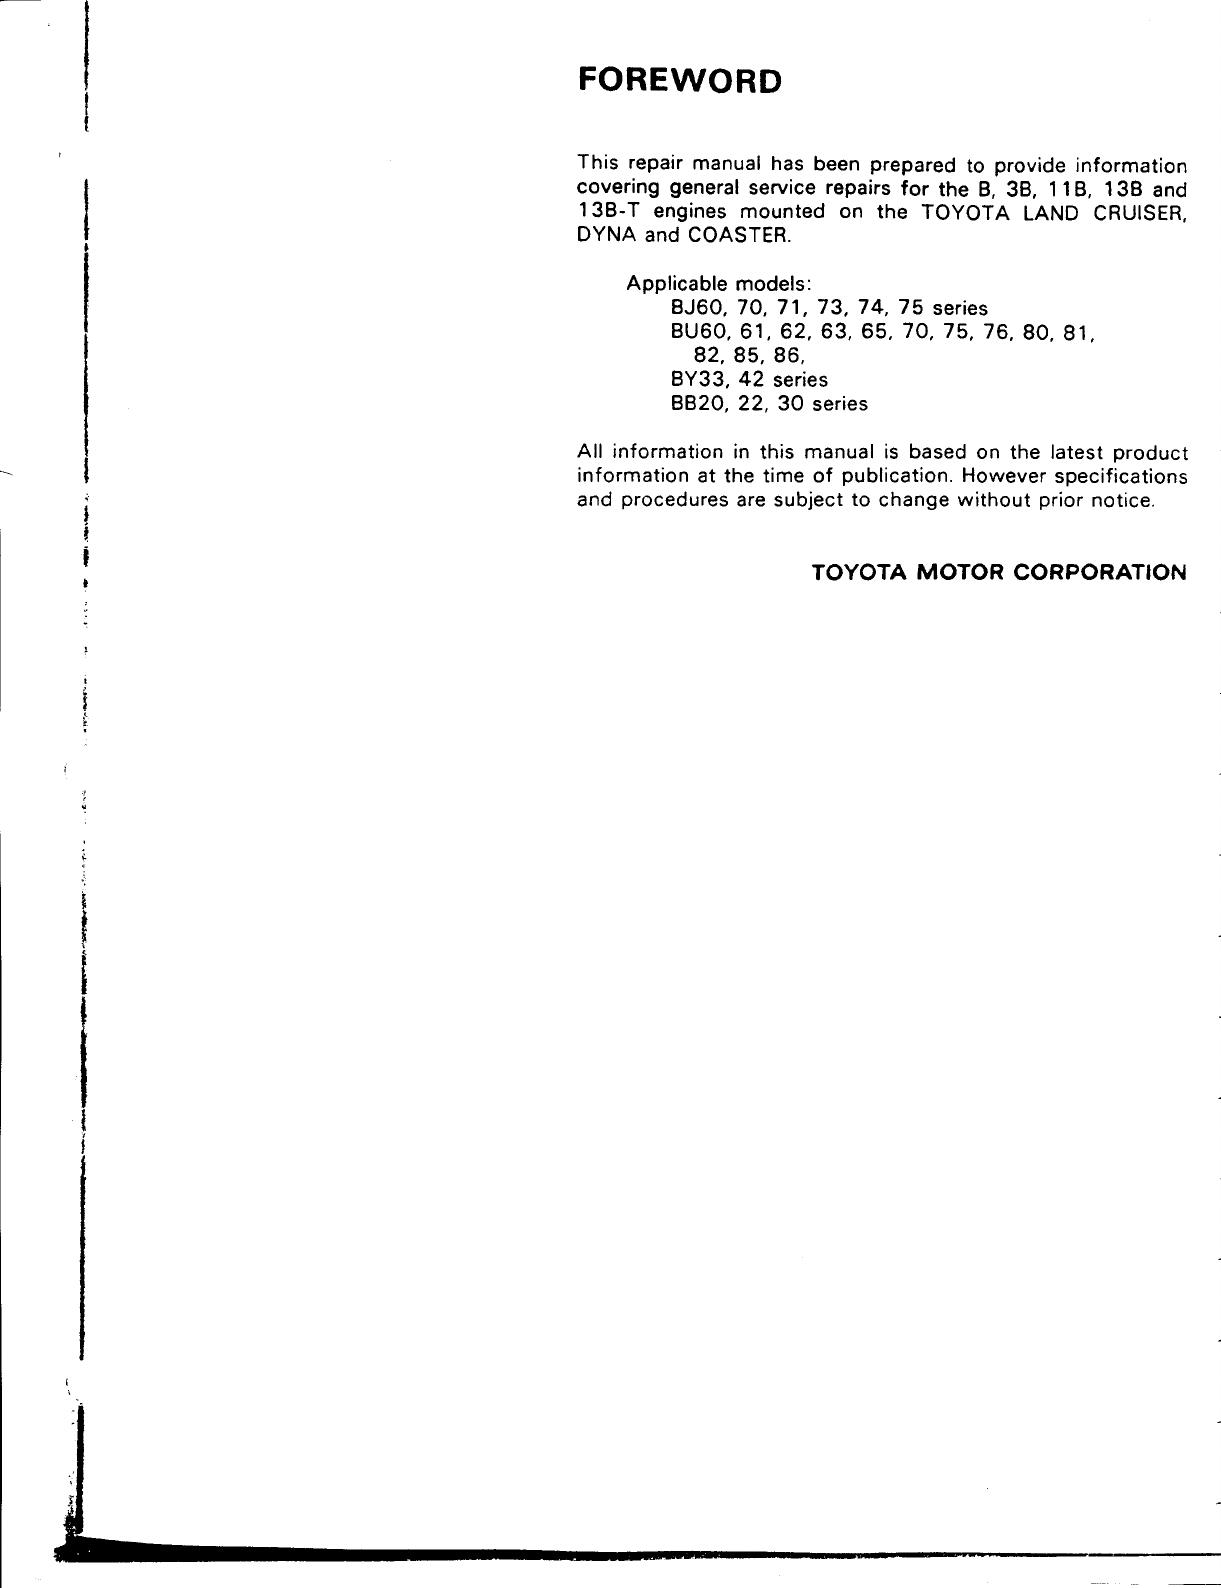 Toyota Dyna 1994 Misc Documents 13B T Engine Manual PDF